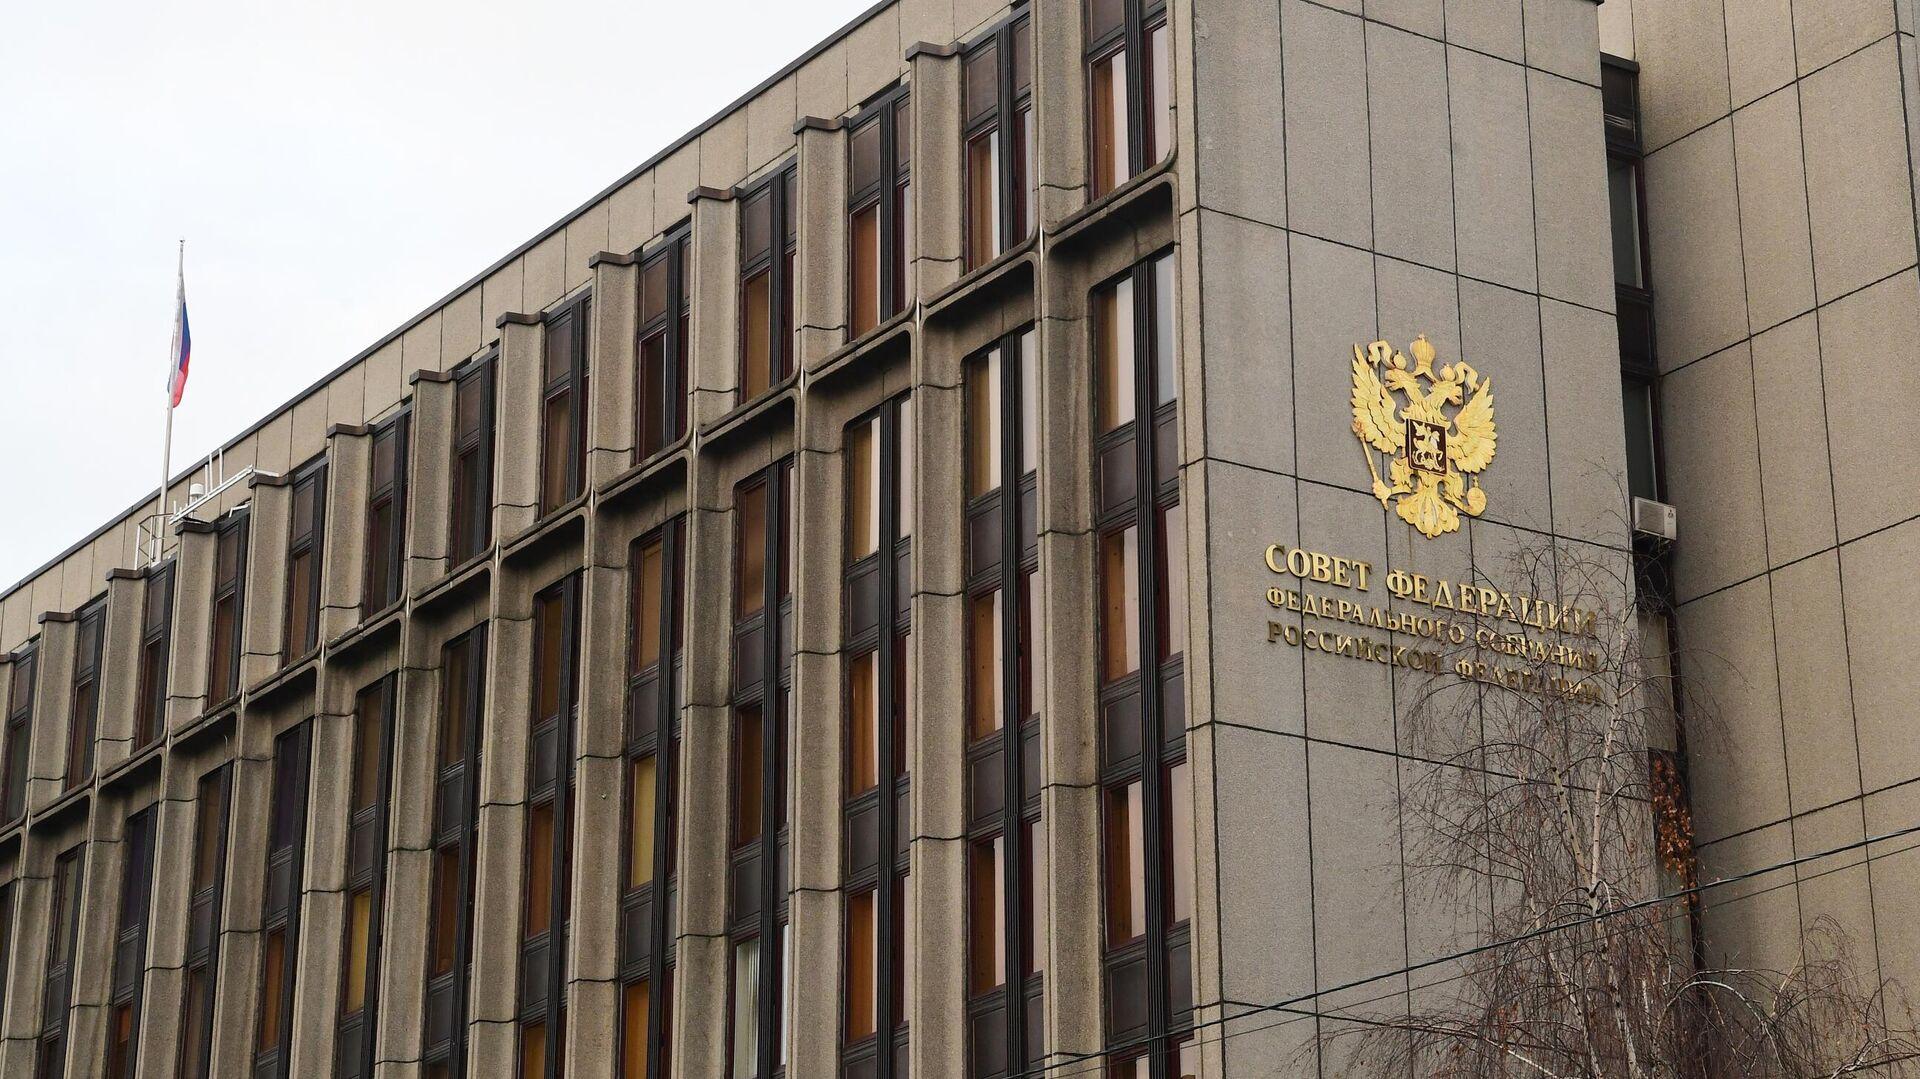 Здание Совета Федерации РФ в Москве - РИА Новости, 1920, 17.02.2021